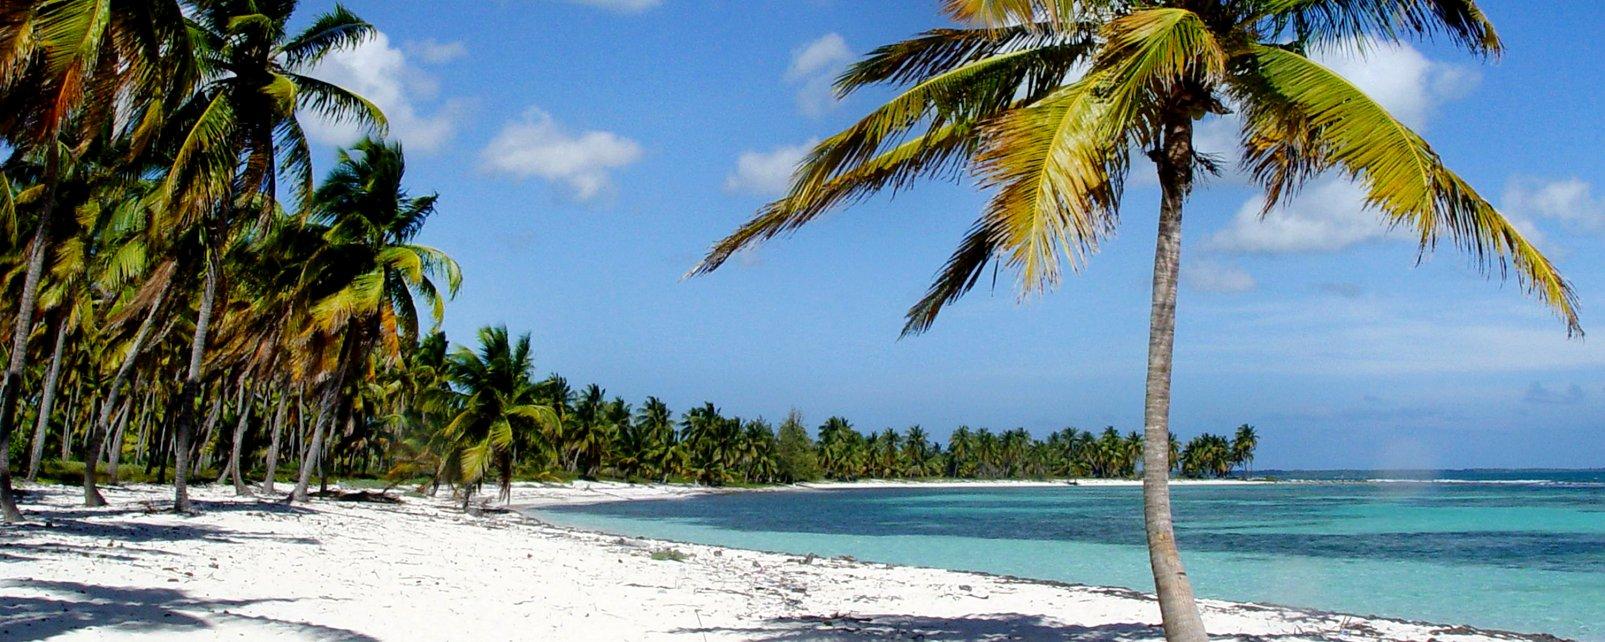 Bayahibe beach, Bayahibe village, Islands and beaches, Bayahibe, Dominican Republic